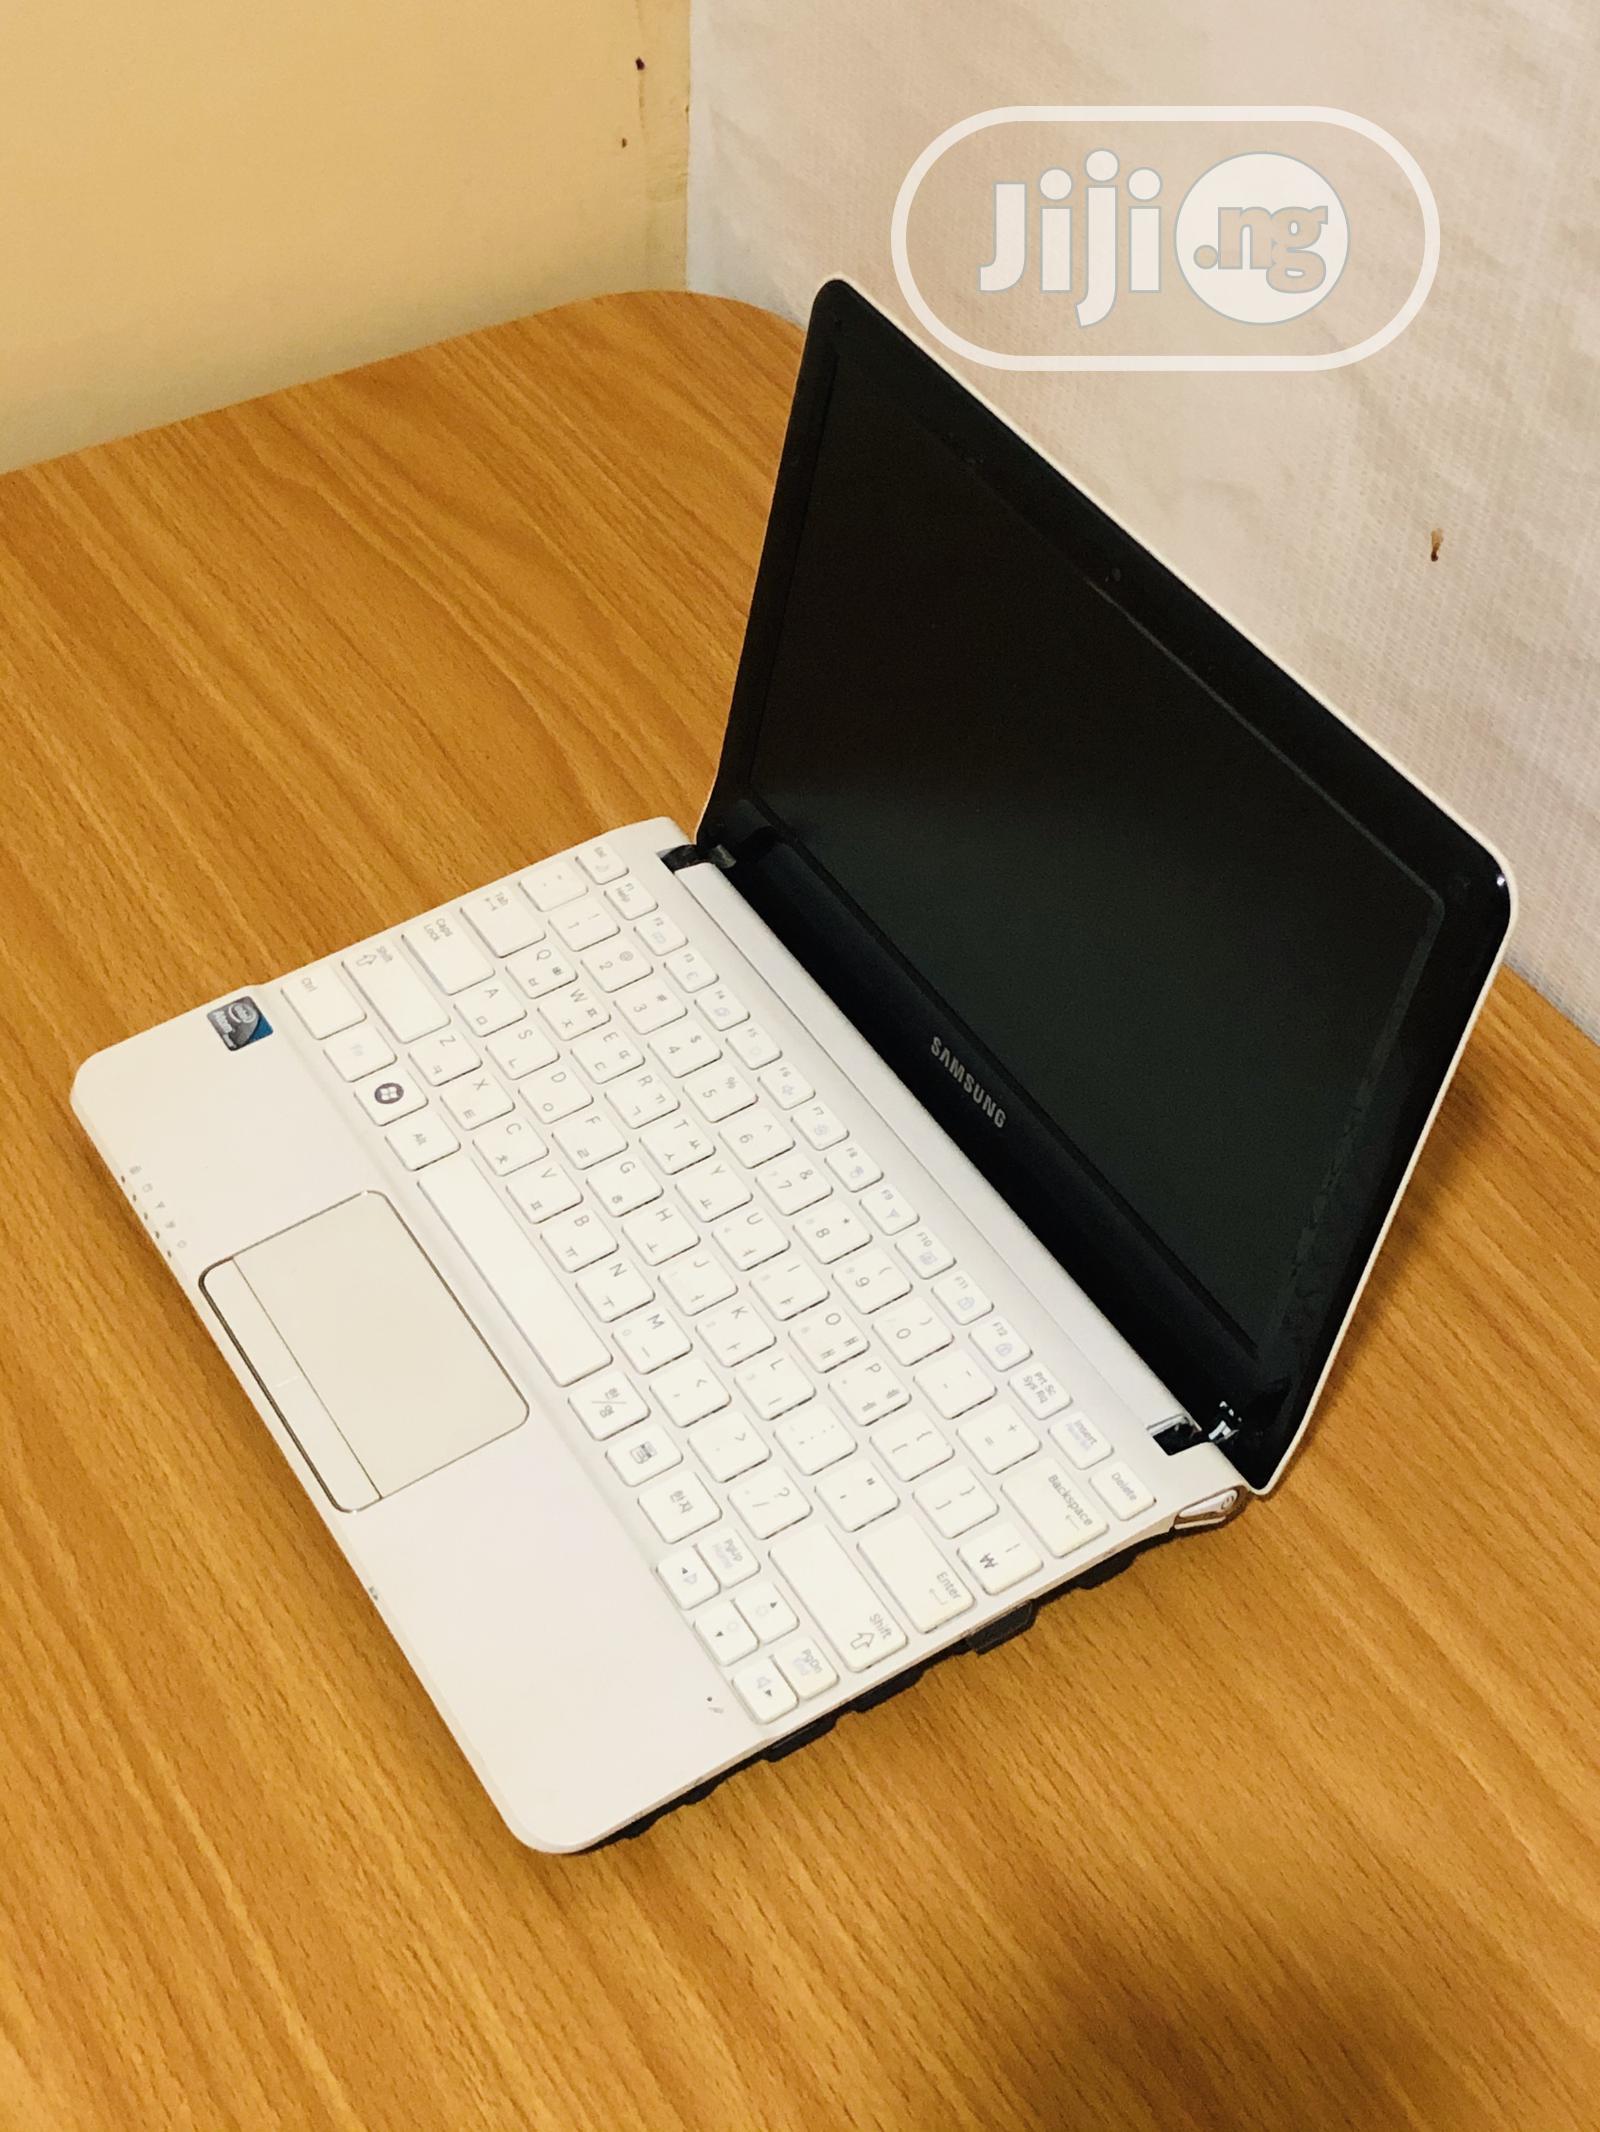 Laptop Samsung NC110 2GB Intel HDD 160GB